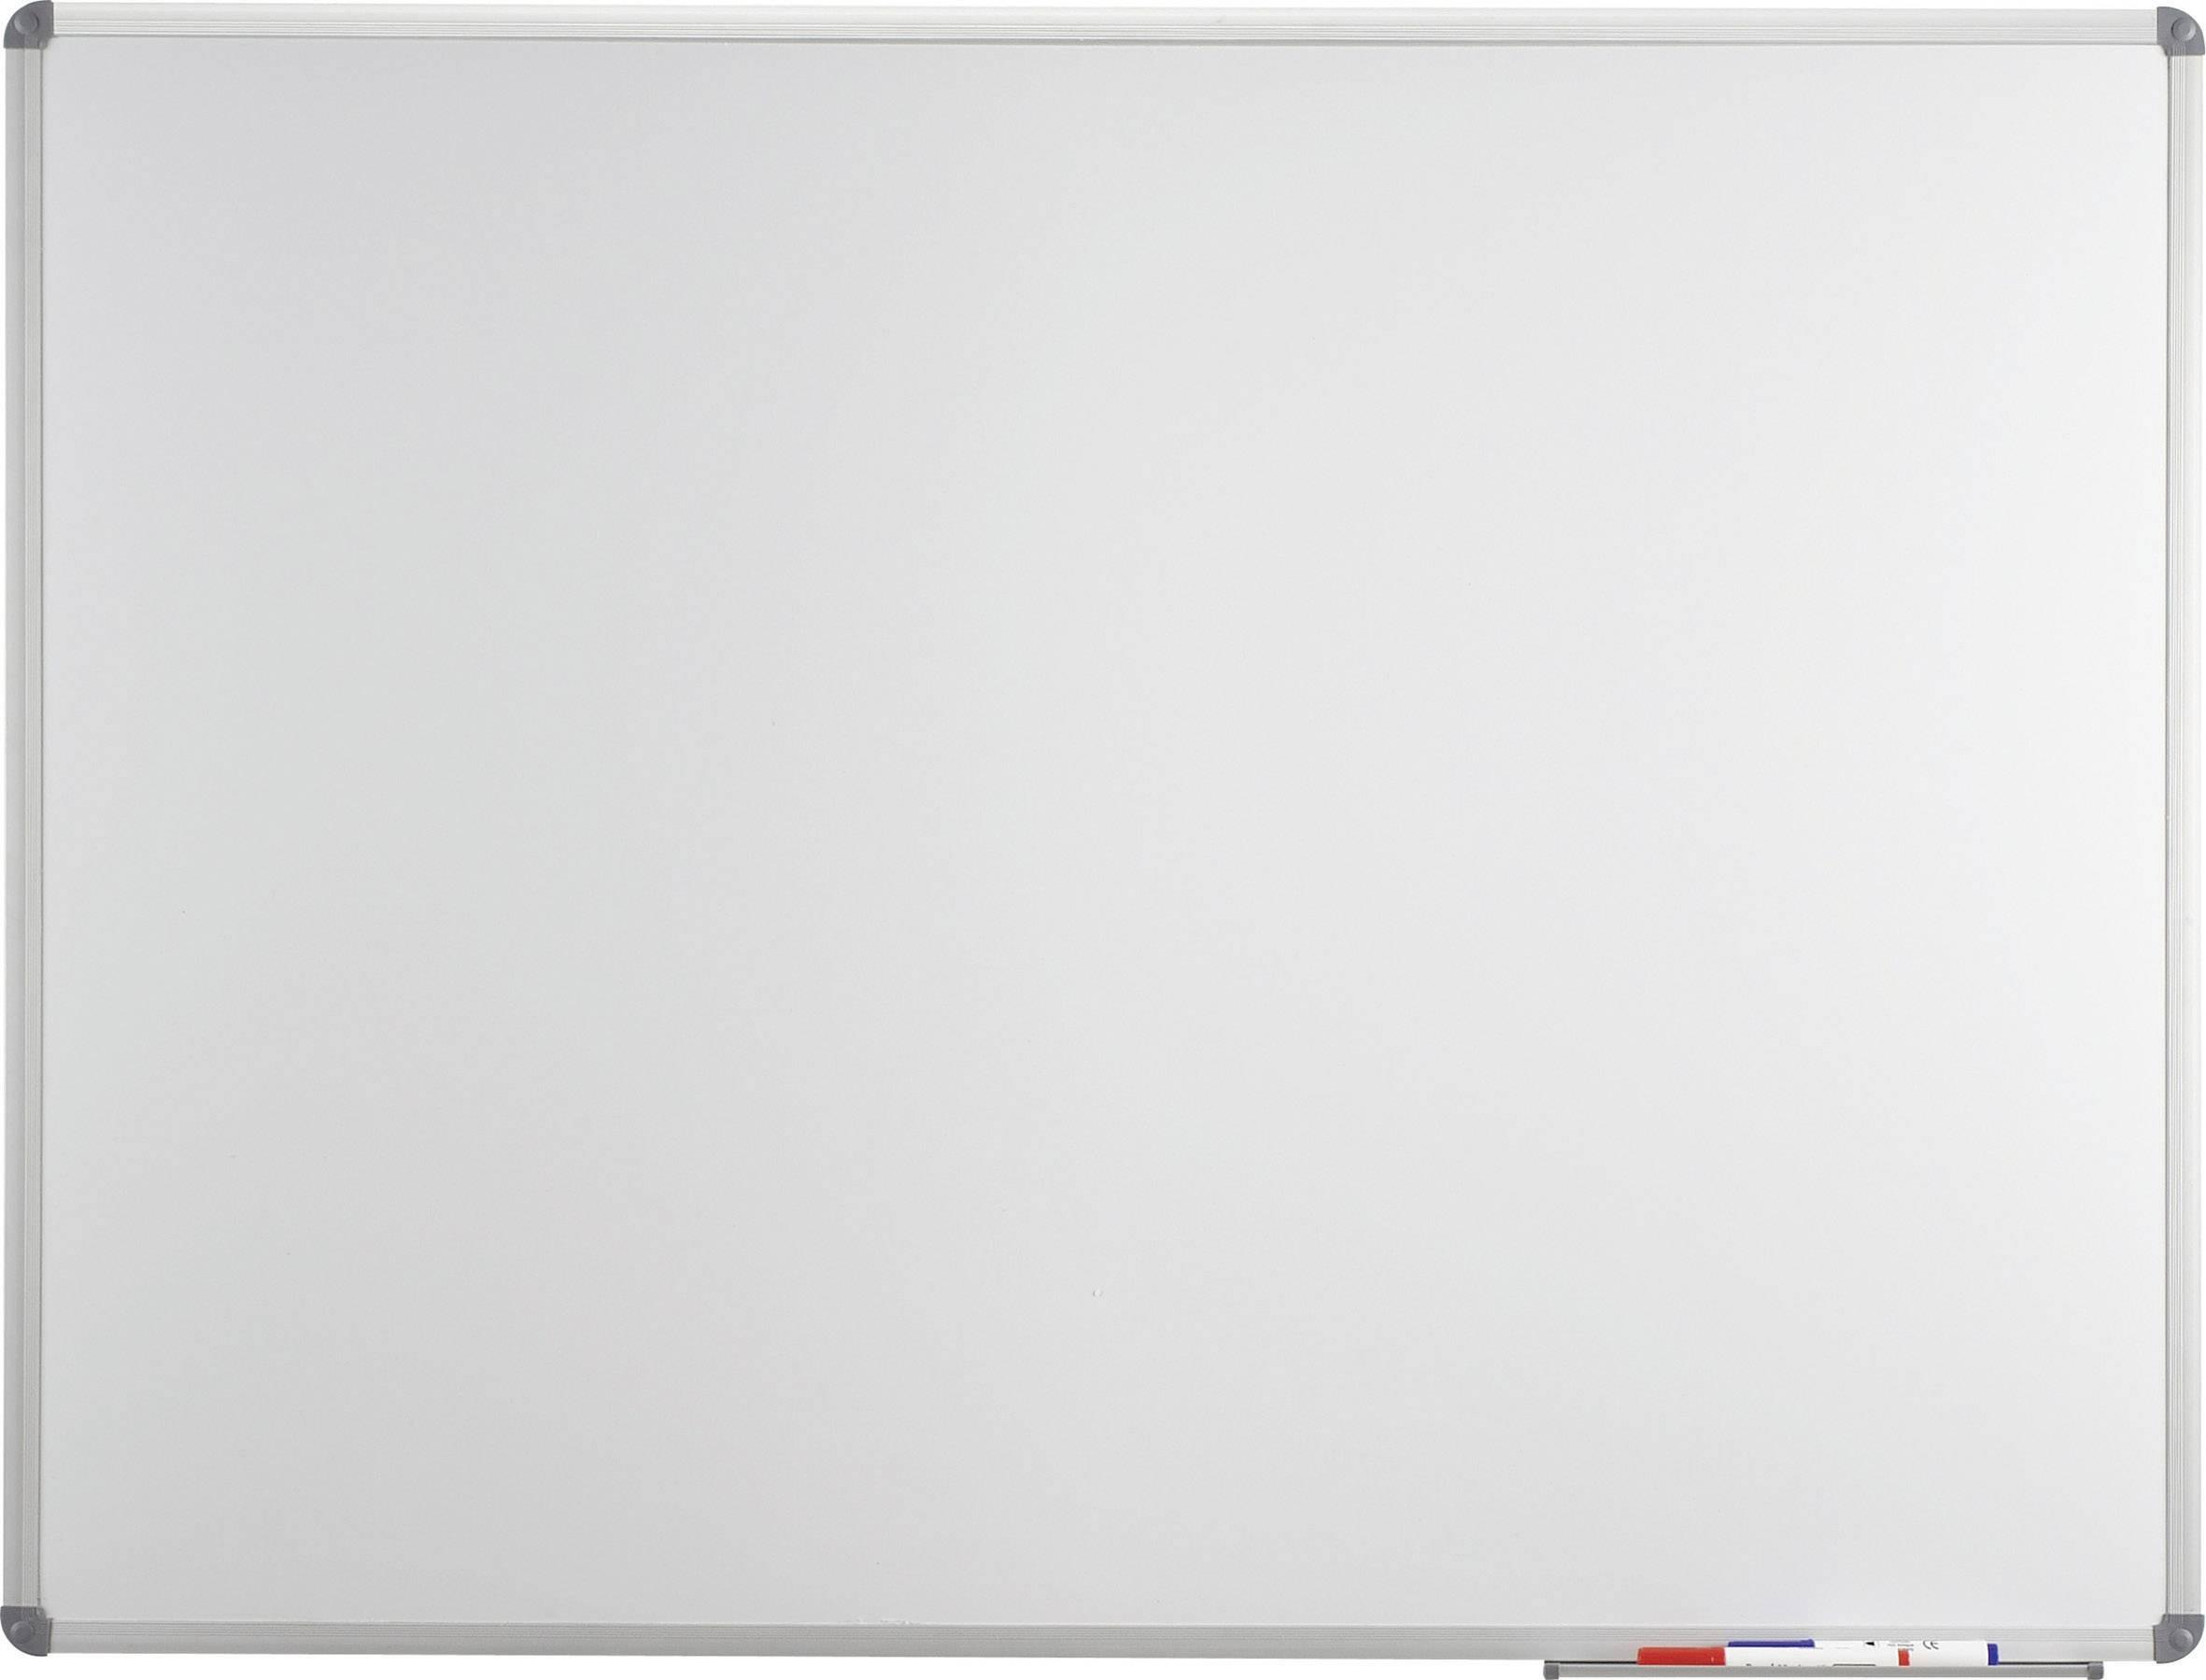 Whiteboard 120 cm x 90 cm Magnettafel Schreibtafel Memoboard Wandtafel